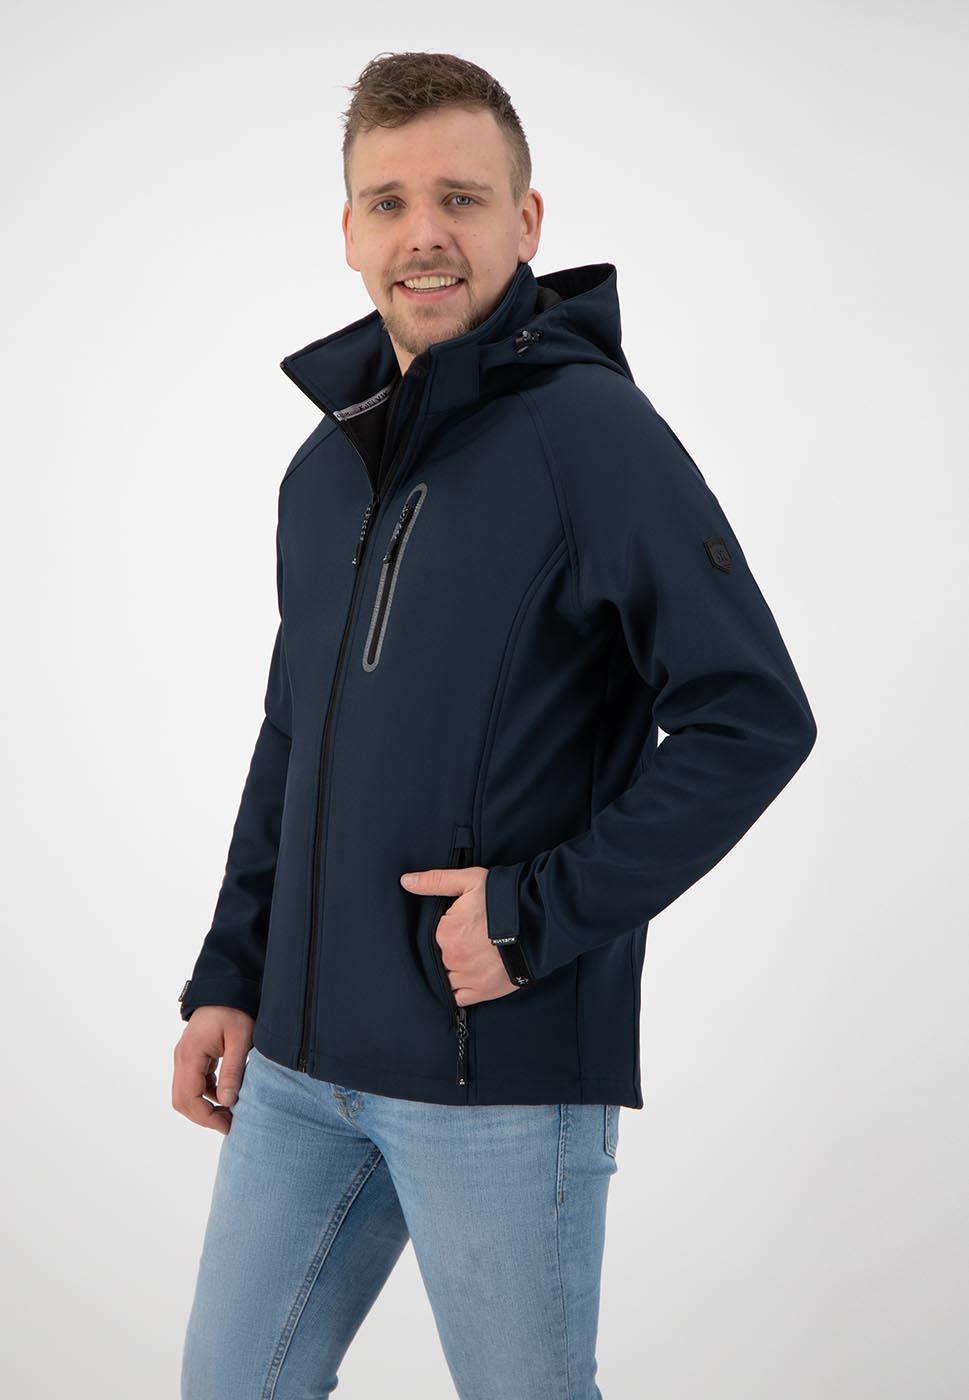 Kjelvik Scandinavian Clothing - Men Softshell Kevan Navy